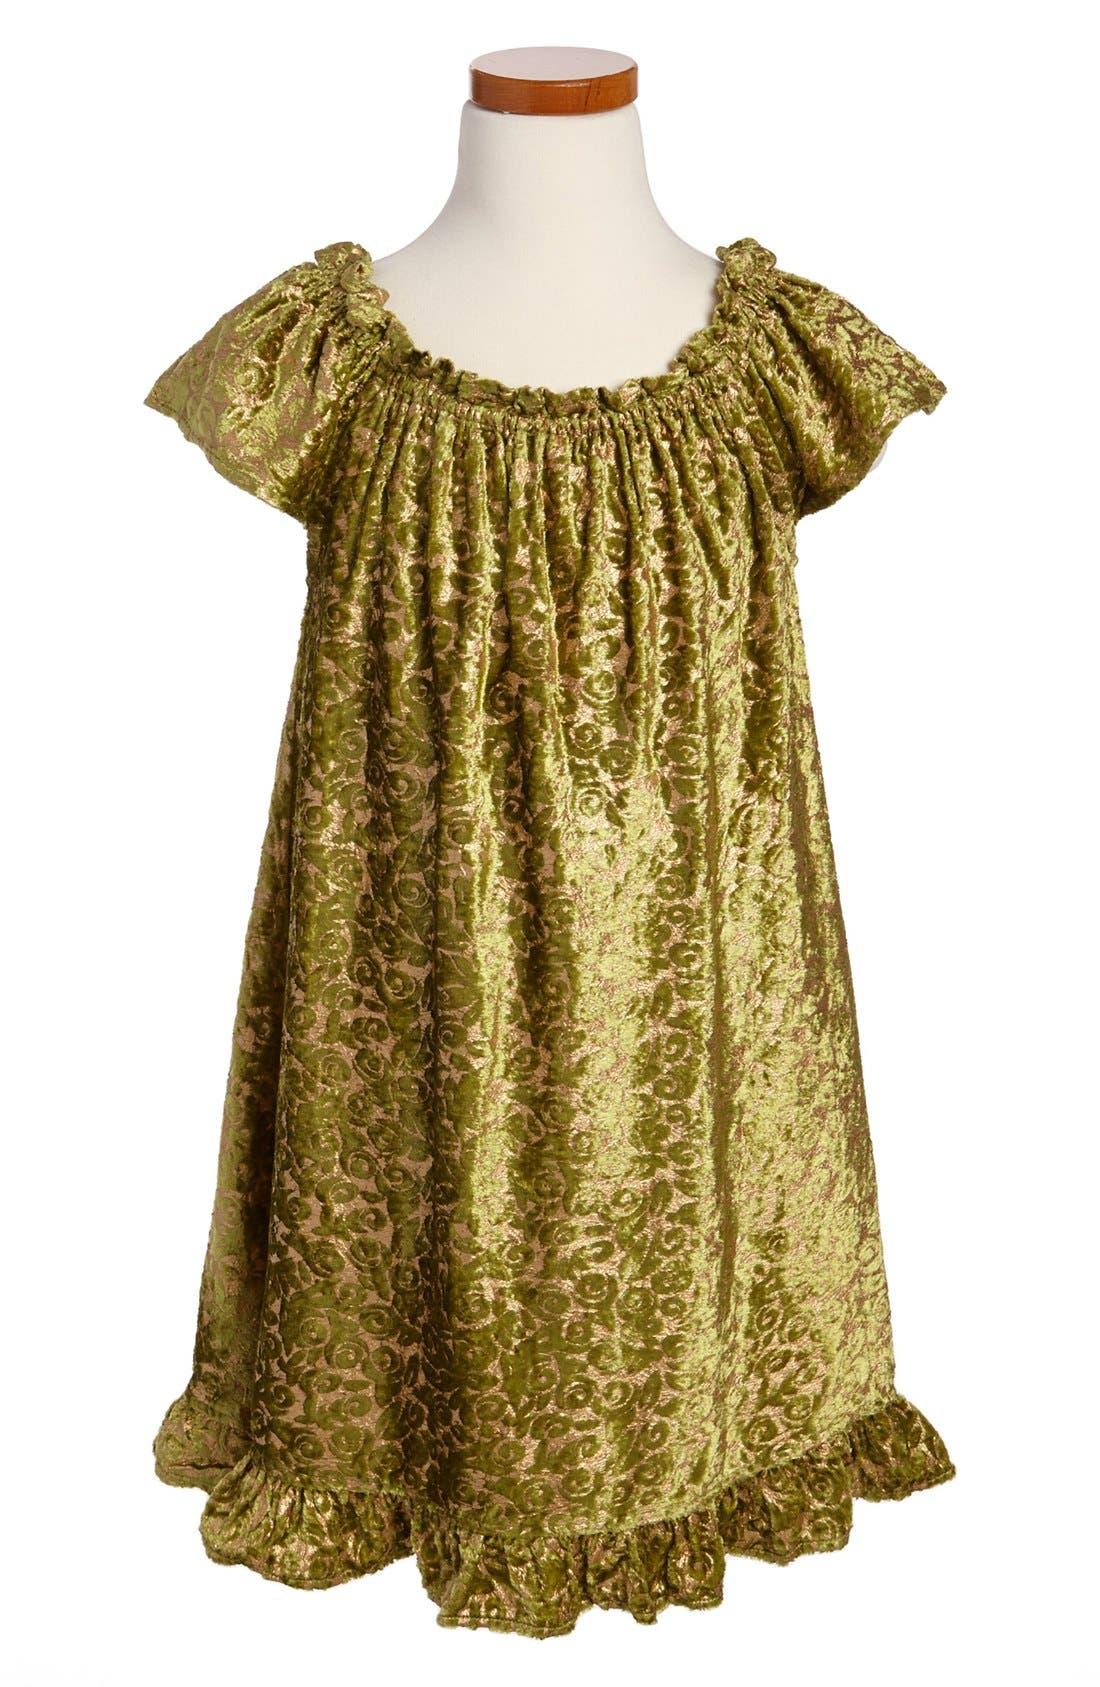 Alternate Image 1 Selected - Peek 'Astor' Dress (Toddler Girls, Little Girls & Big Girls)